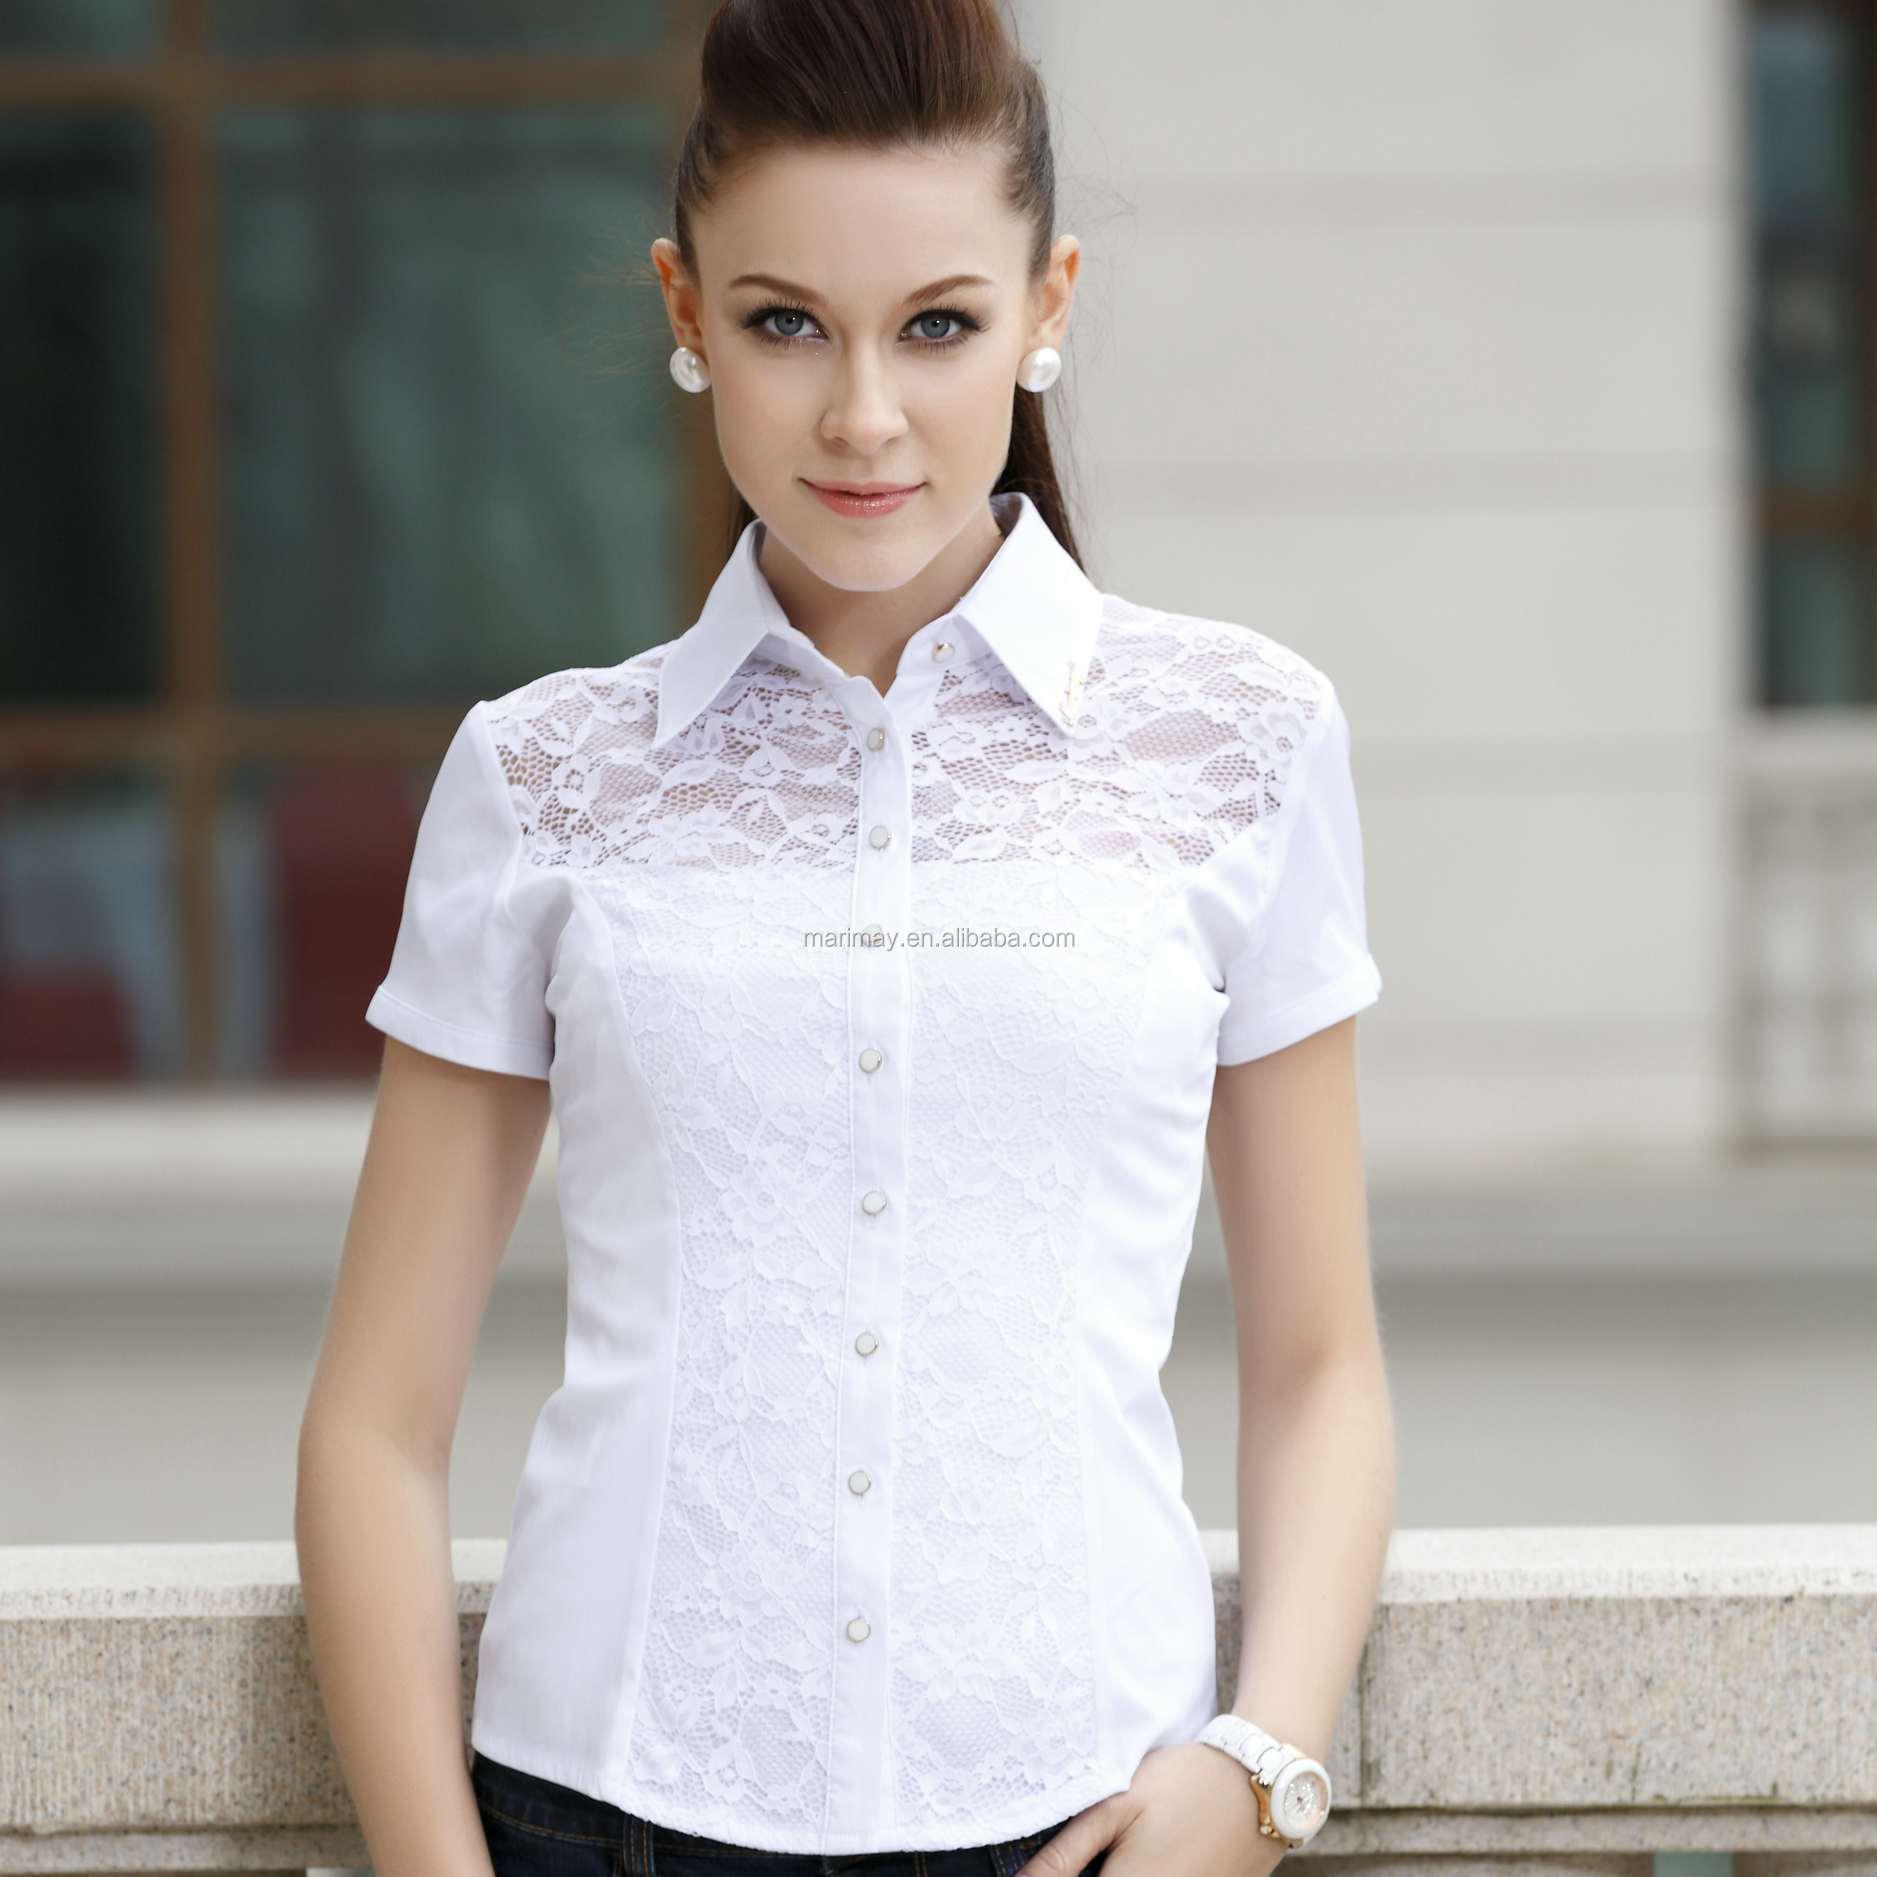 Fashion Formal Blouse For Women,Woman Wear White Lace Formal ...